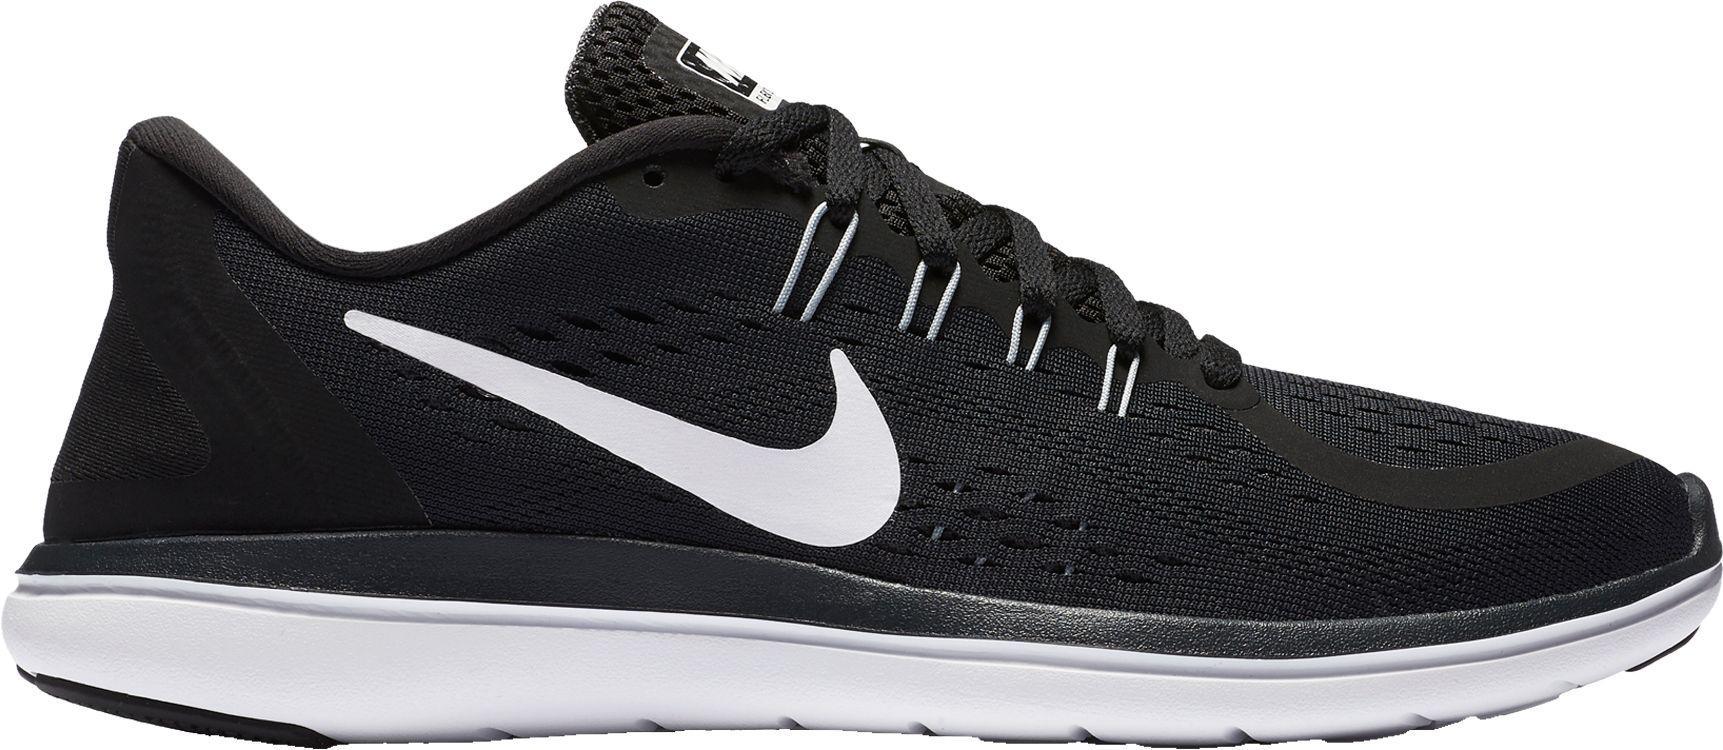 347315fe79be9 Lyst - Nike Flex 2017 Rn Running Shoes in Black for Men nike flex running  shoes